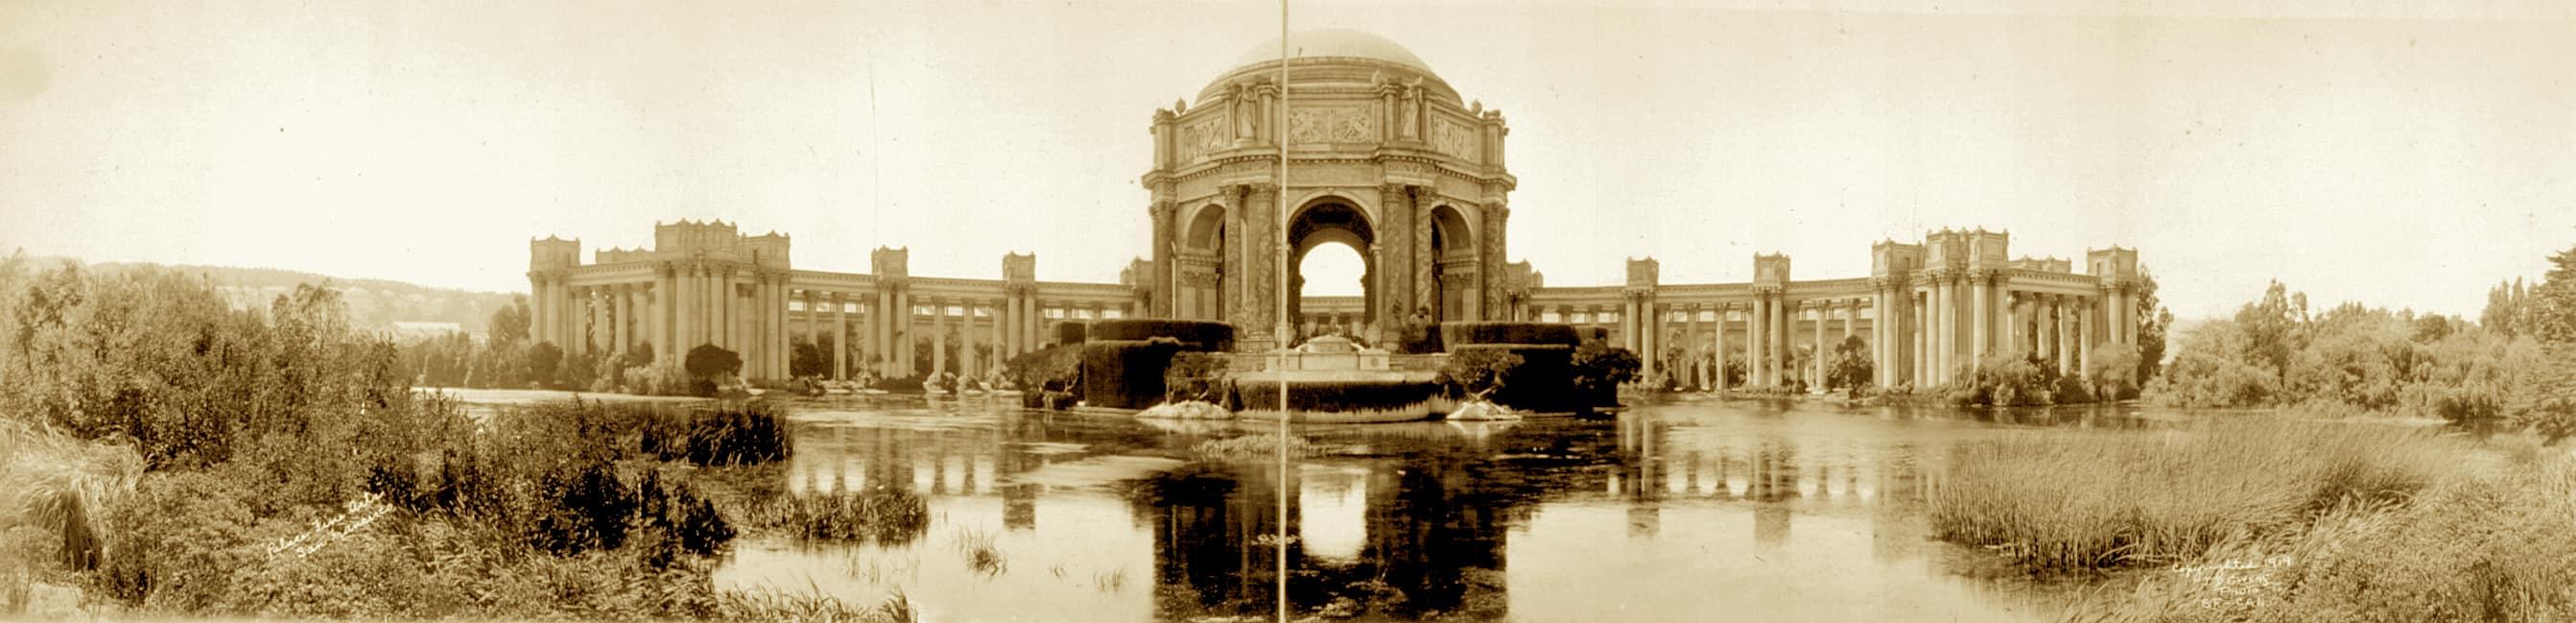 Original Palace of Fine Arts Panorama 1918